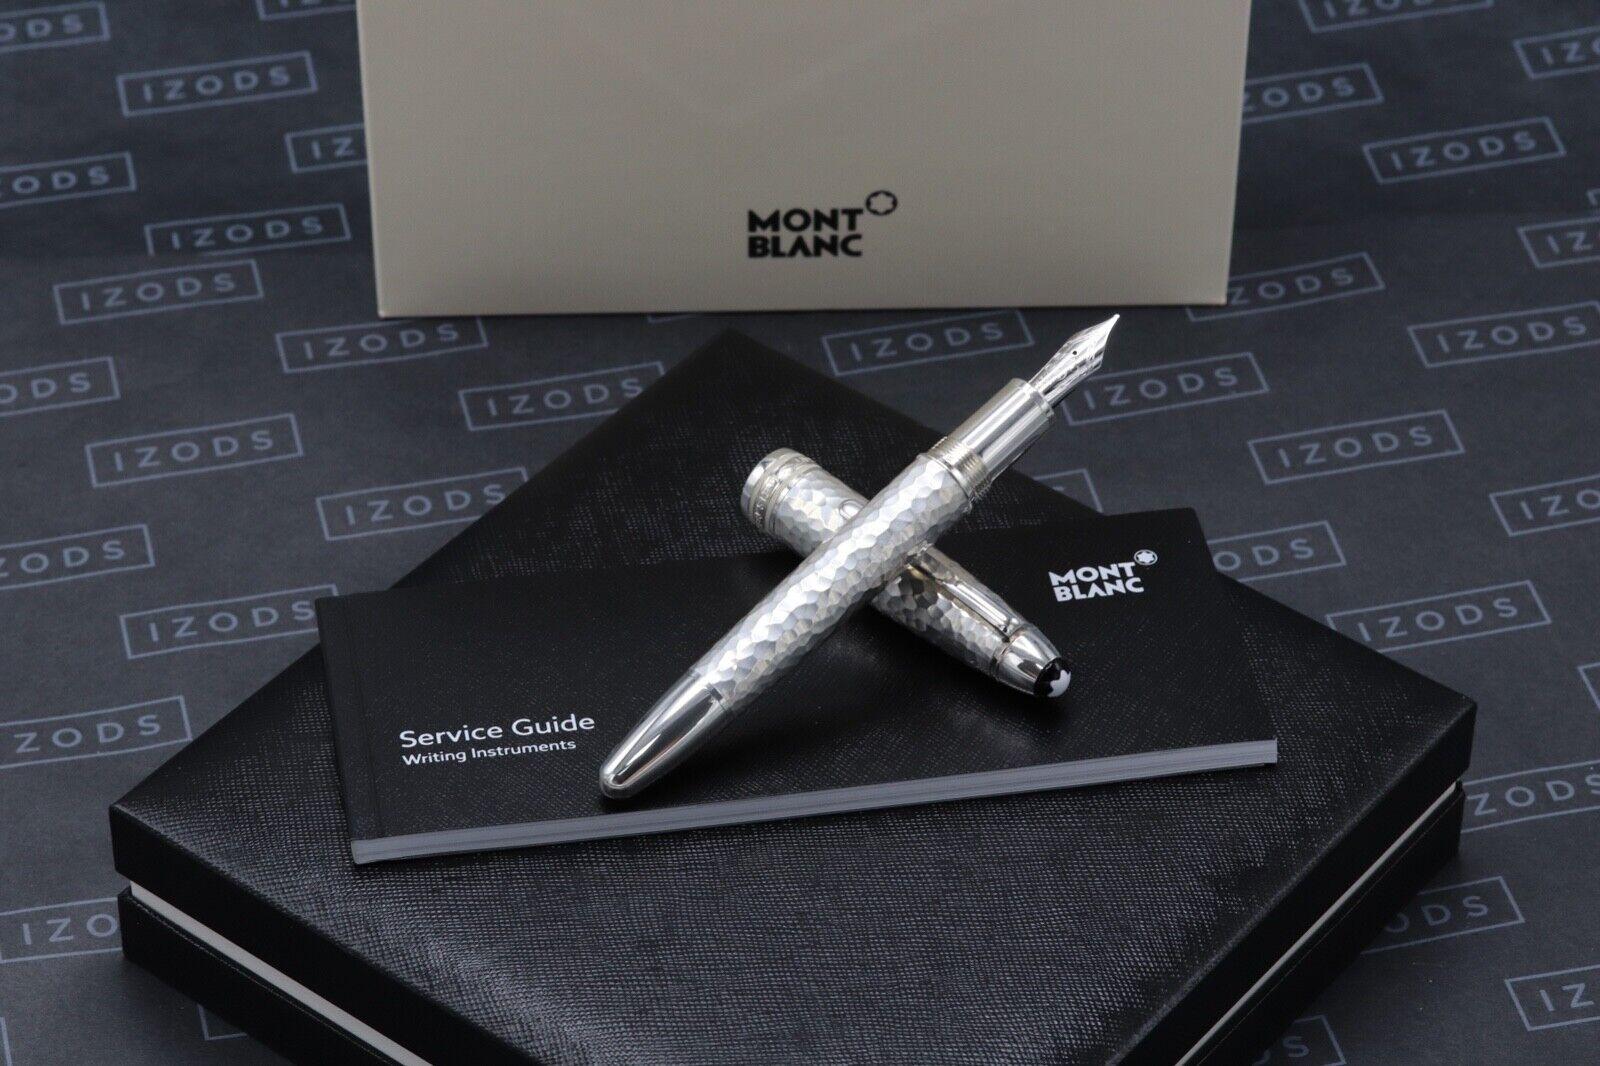 Montblanc Meisterstuck LeGrand Martele Solitaire Silver Fountain Pen